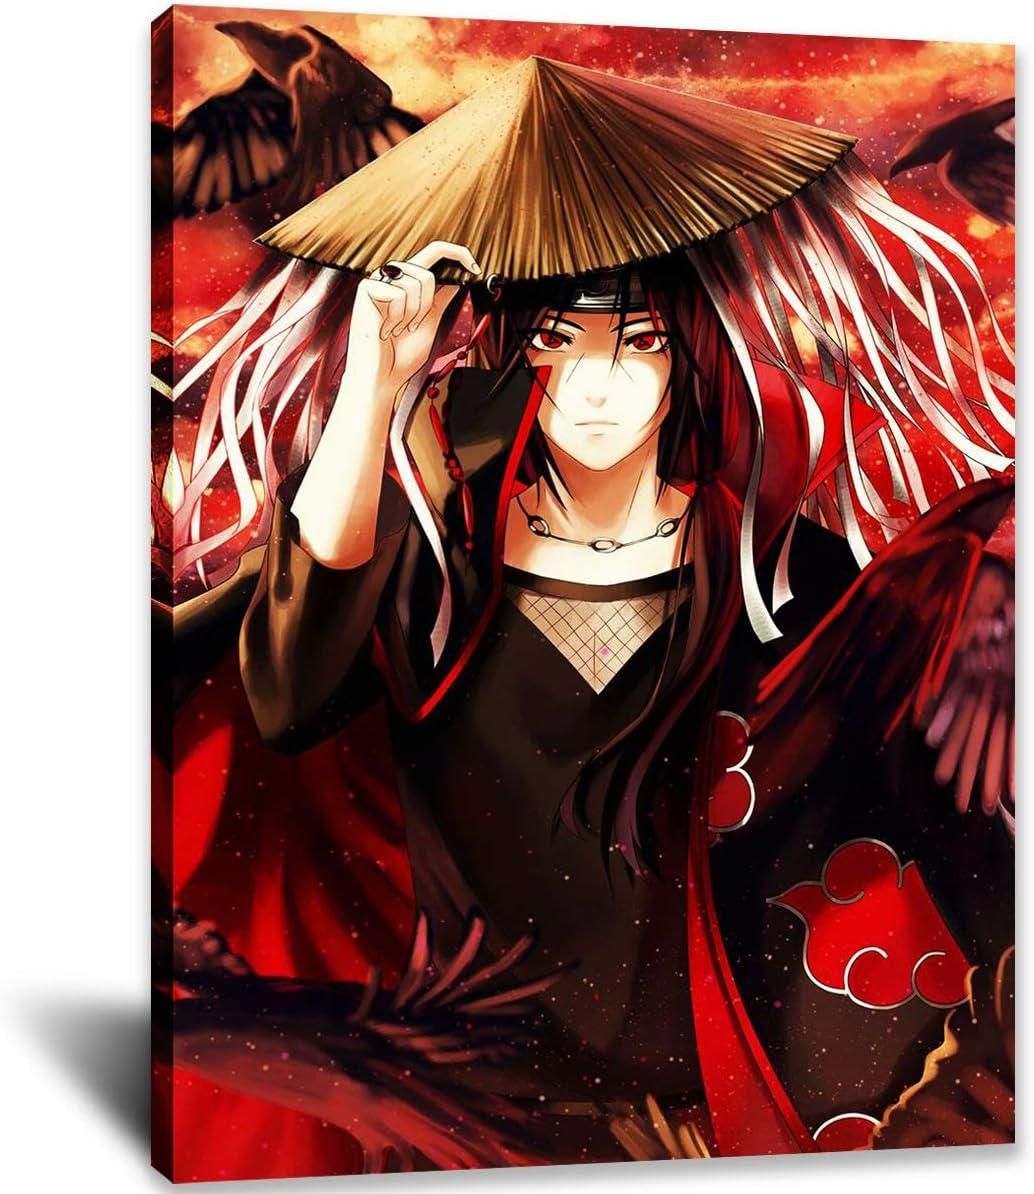 Naruto Canvas Prints 人気商品 Wall Art Anim 定番キャンバス Poster Paintings Japan